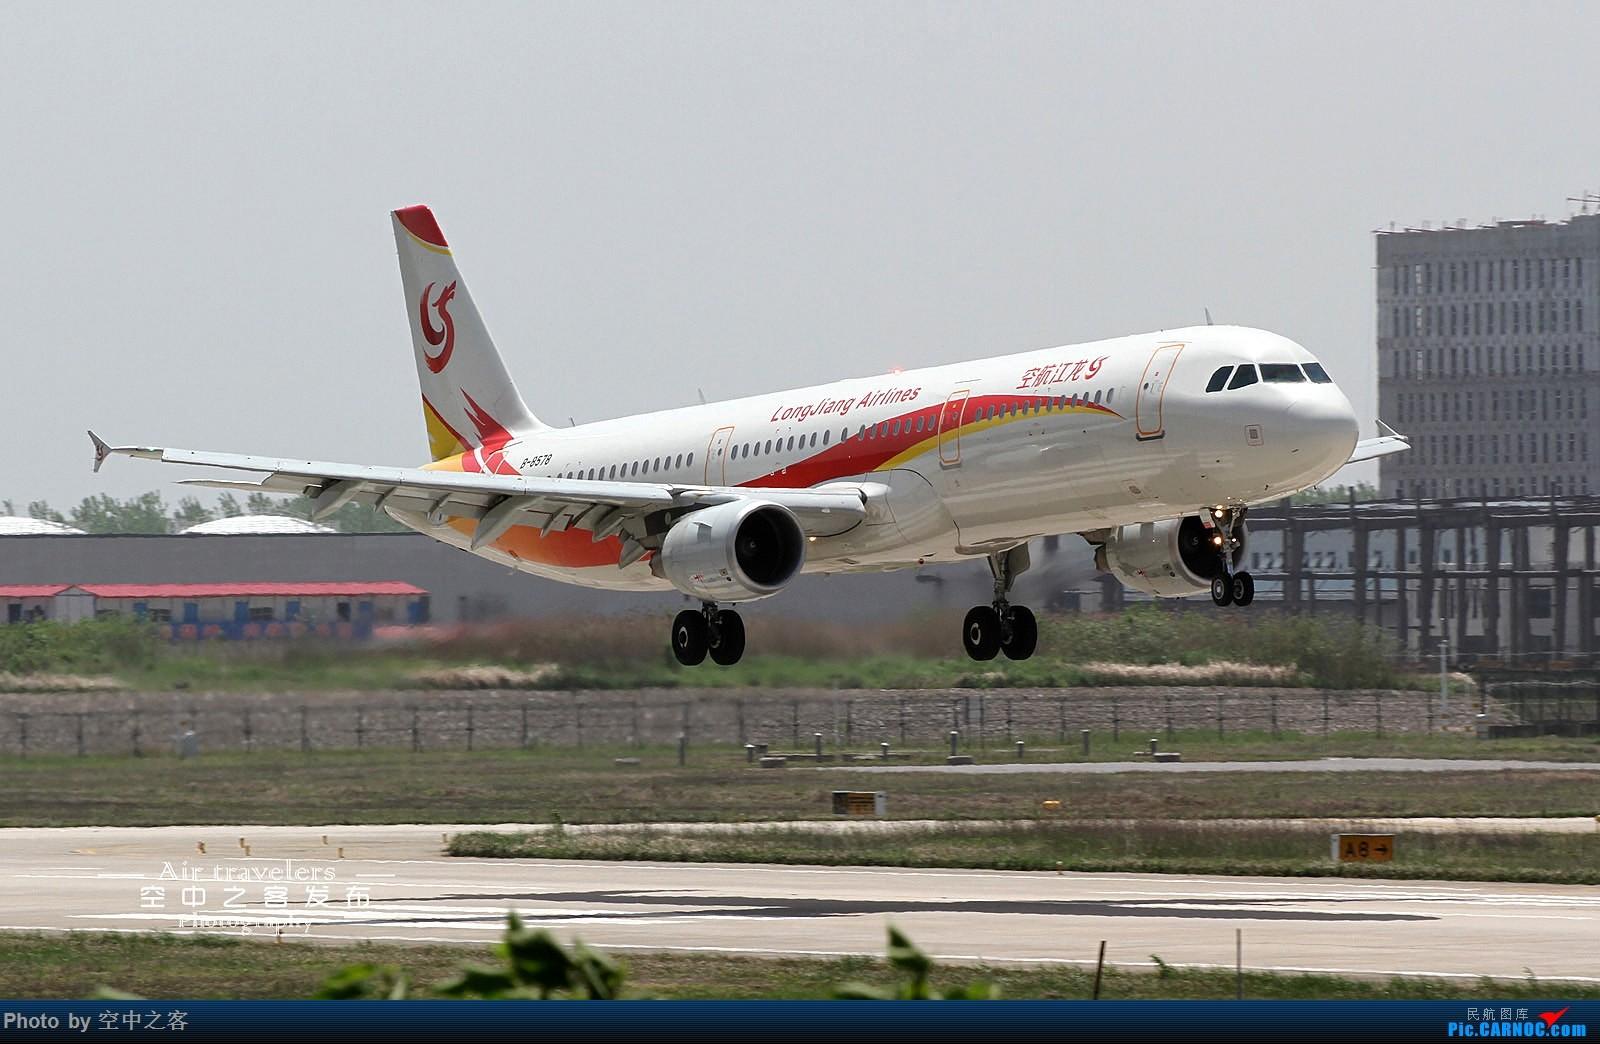 Re:[原创]][合肥飞友会·霸都打机队]空中之客发布 大佬们都不来的新机场 龙江321 海航 首航广告机来袭 AIRBUS A321-200 B-8578 合肥新桥国际机场